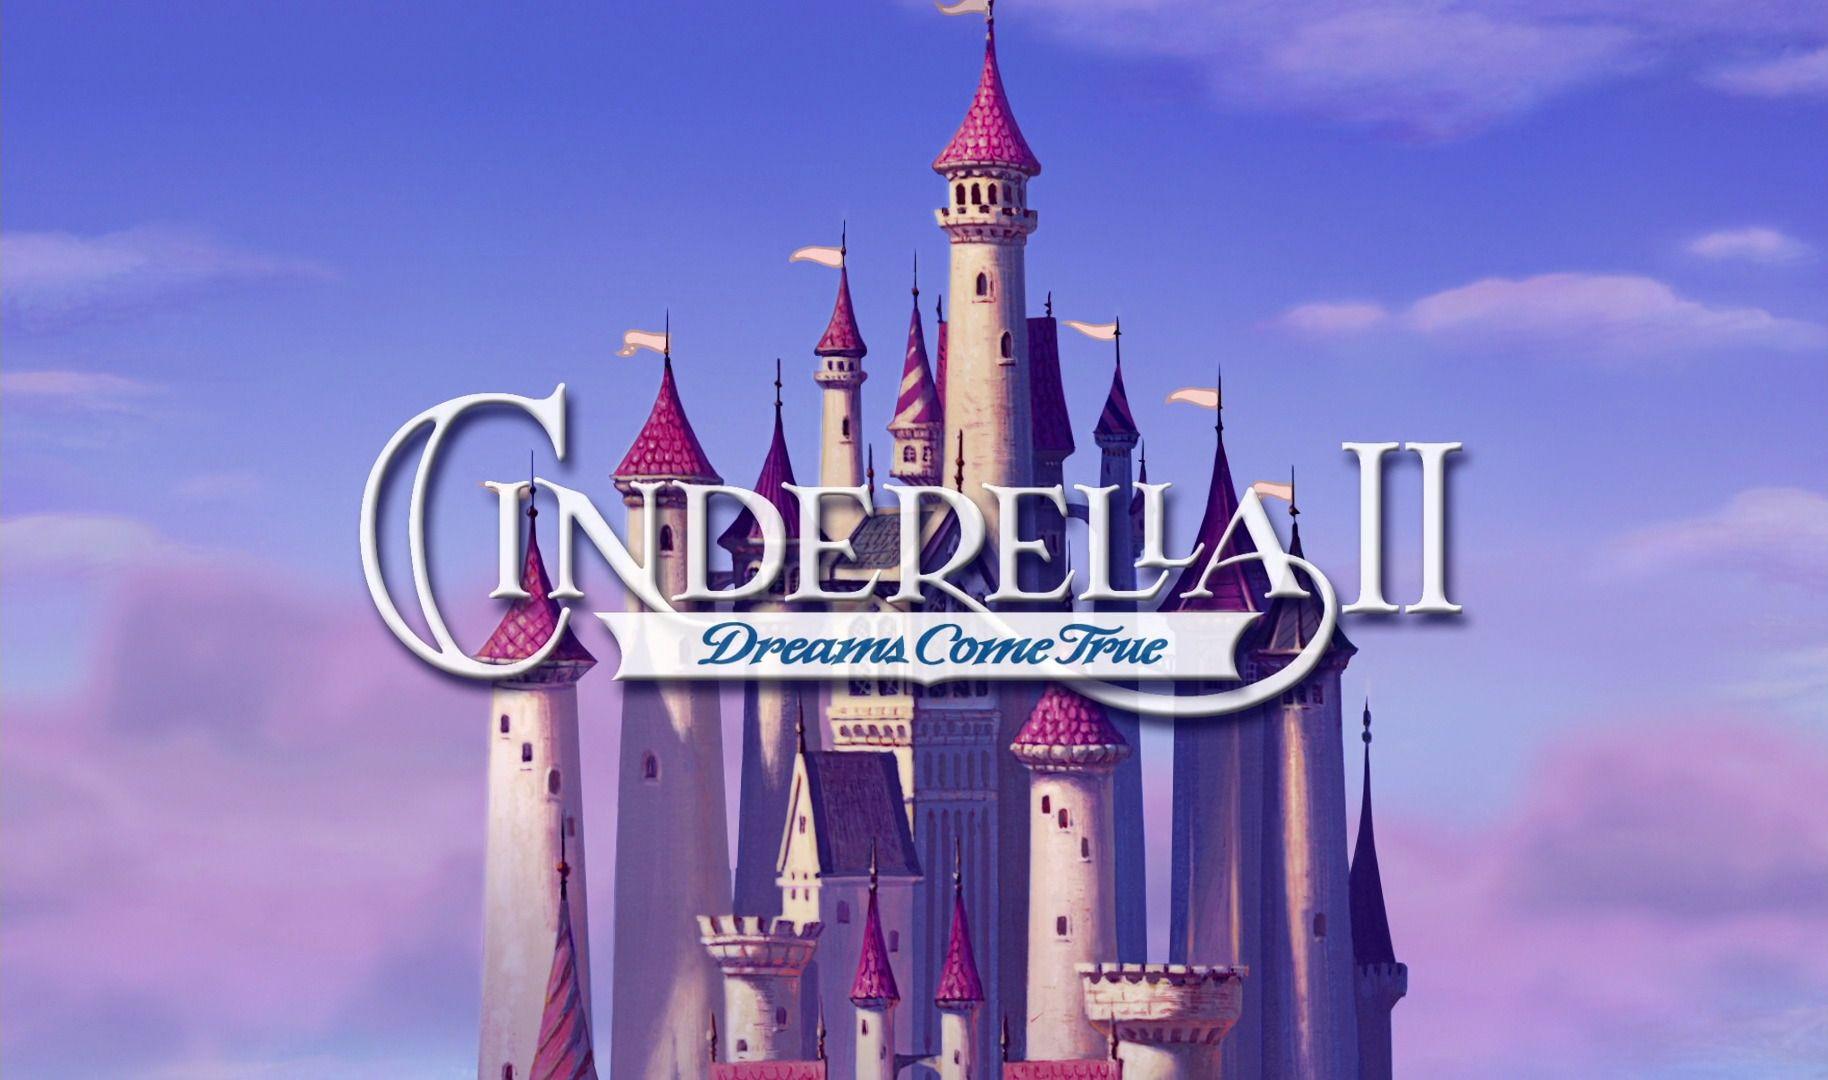 Cinderella Ii Dreams Come True 2002 Disney Screencaps Com Disney Princess Images Disney Challenge Dream Come True